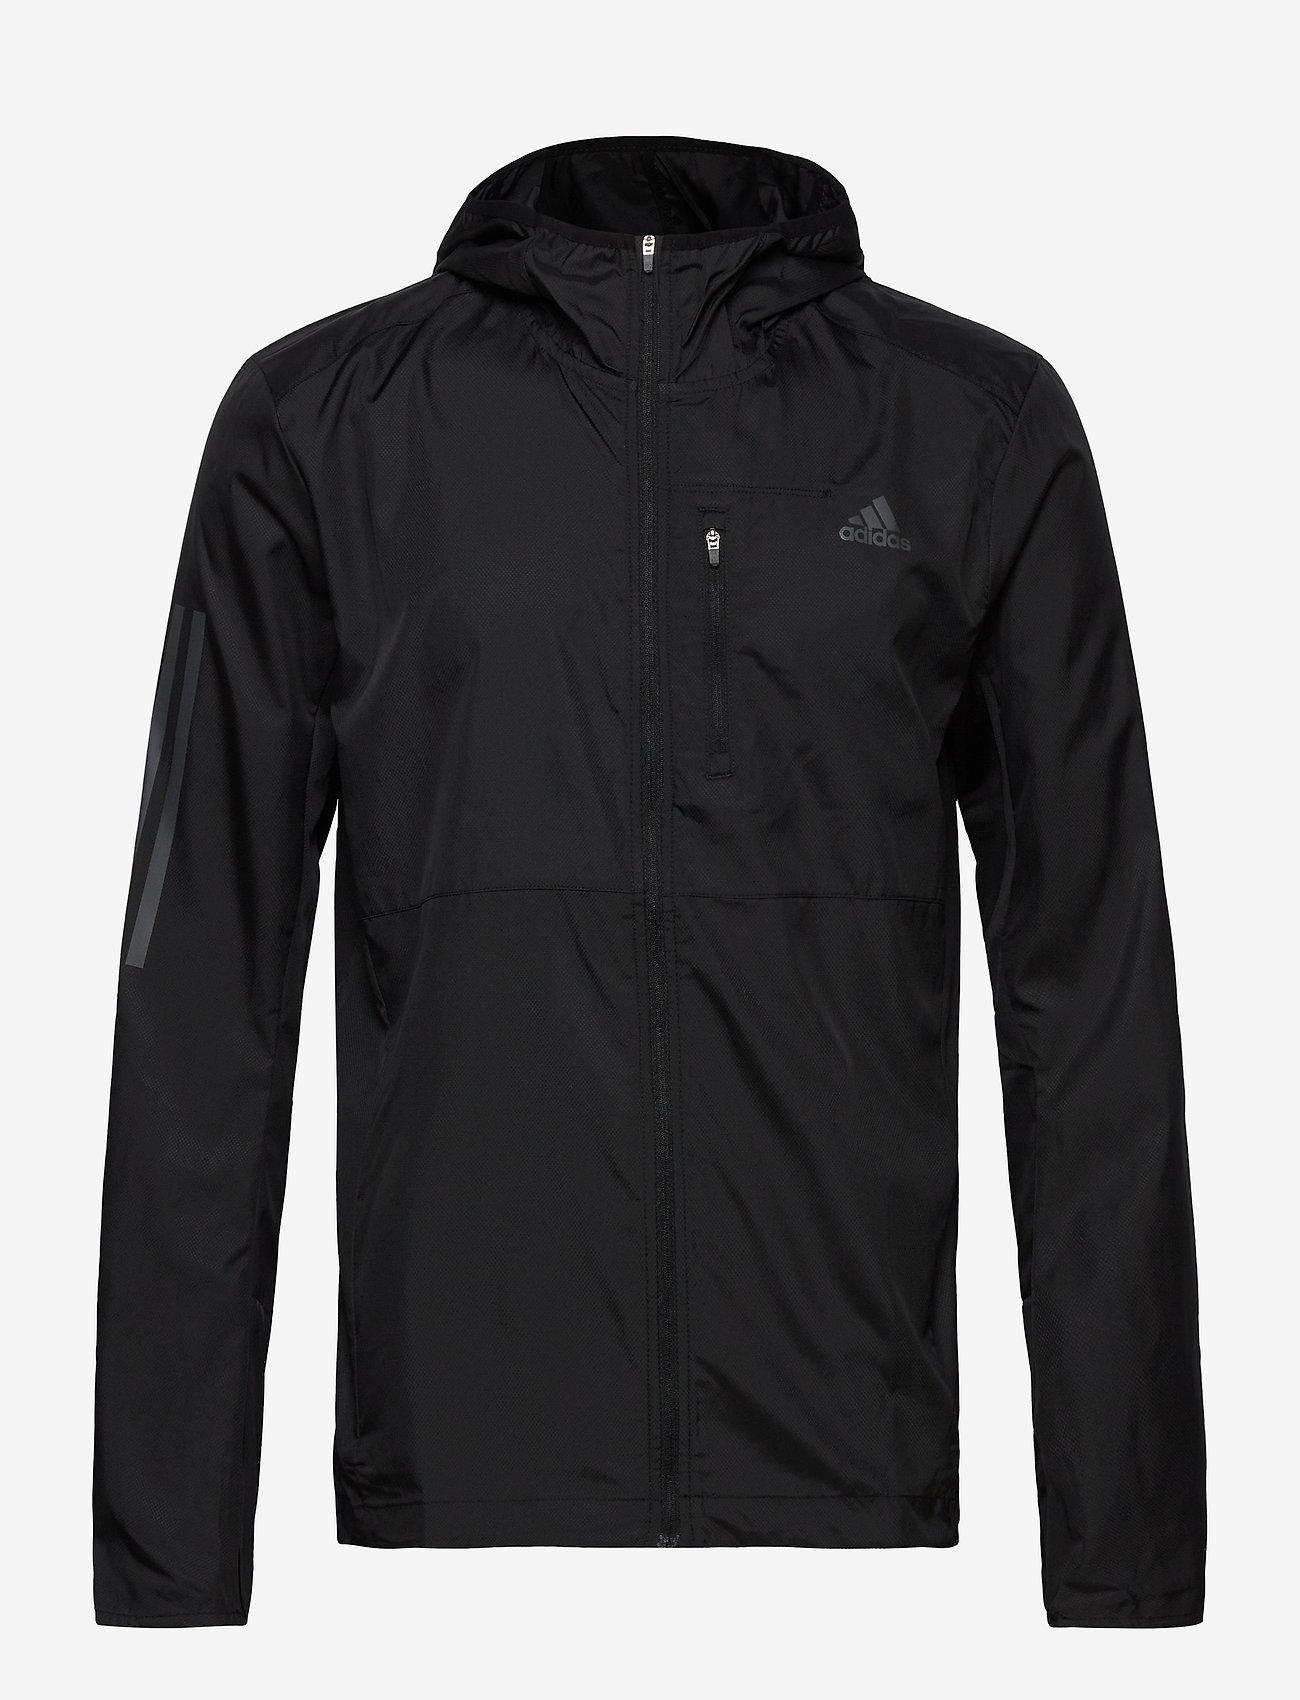 adidas Performance - OWN THE RUN JKT - training jackets - black - 1